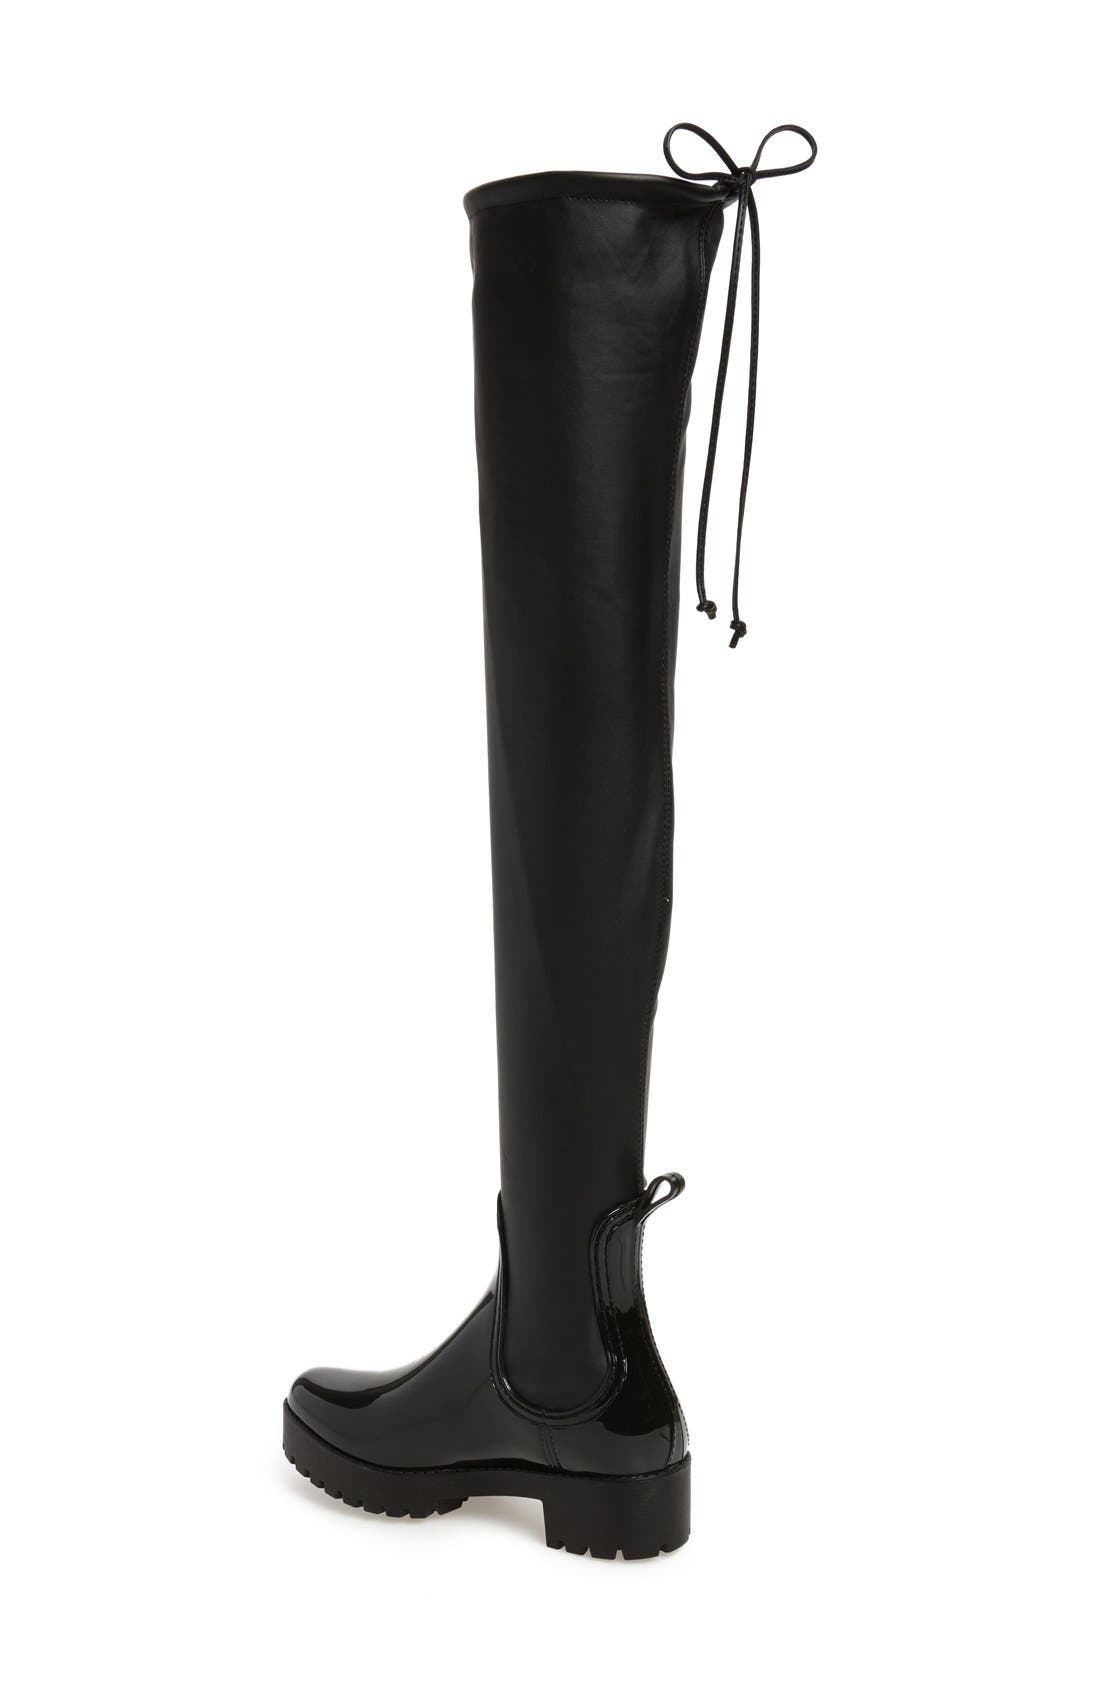 Cloudy Over the Knee Rain Boot,                             Alternate thumbnail 2, color,                             Black Shiny Black